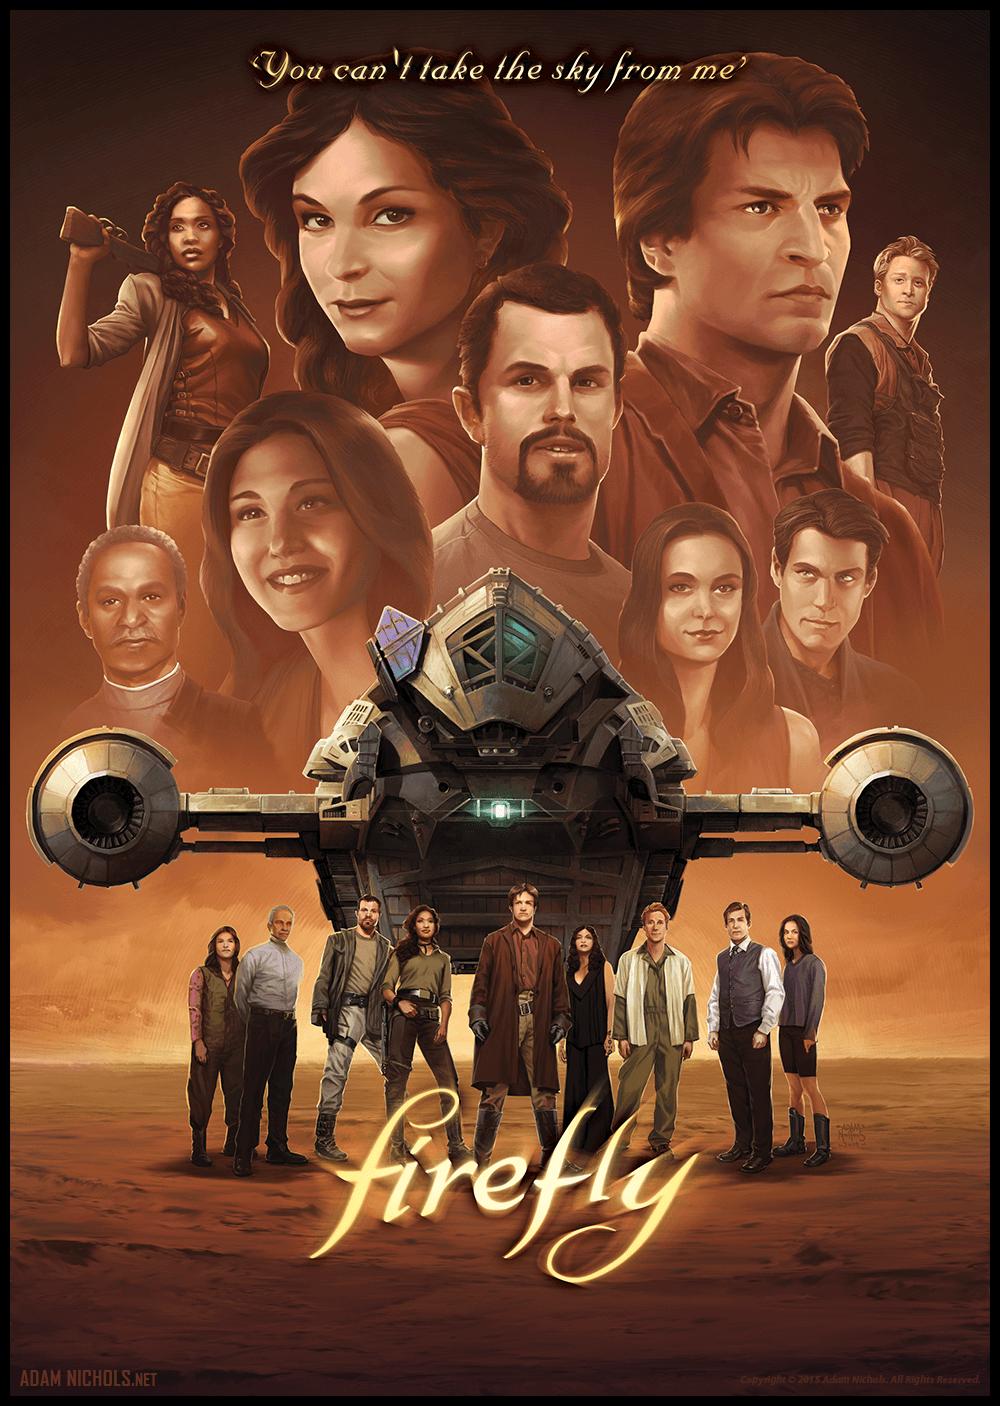 Firefly Illustration - Fan Artwork by Adam Nichols